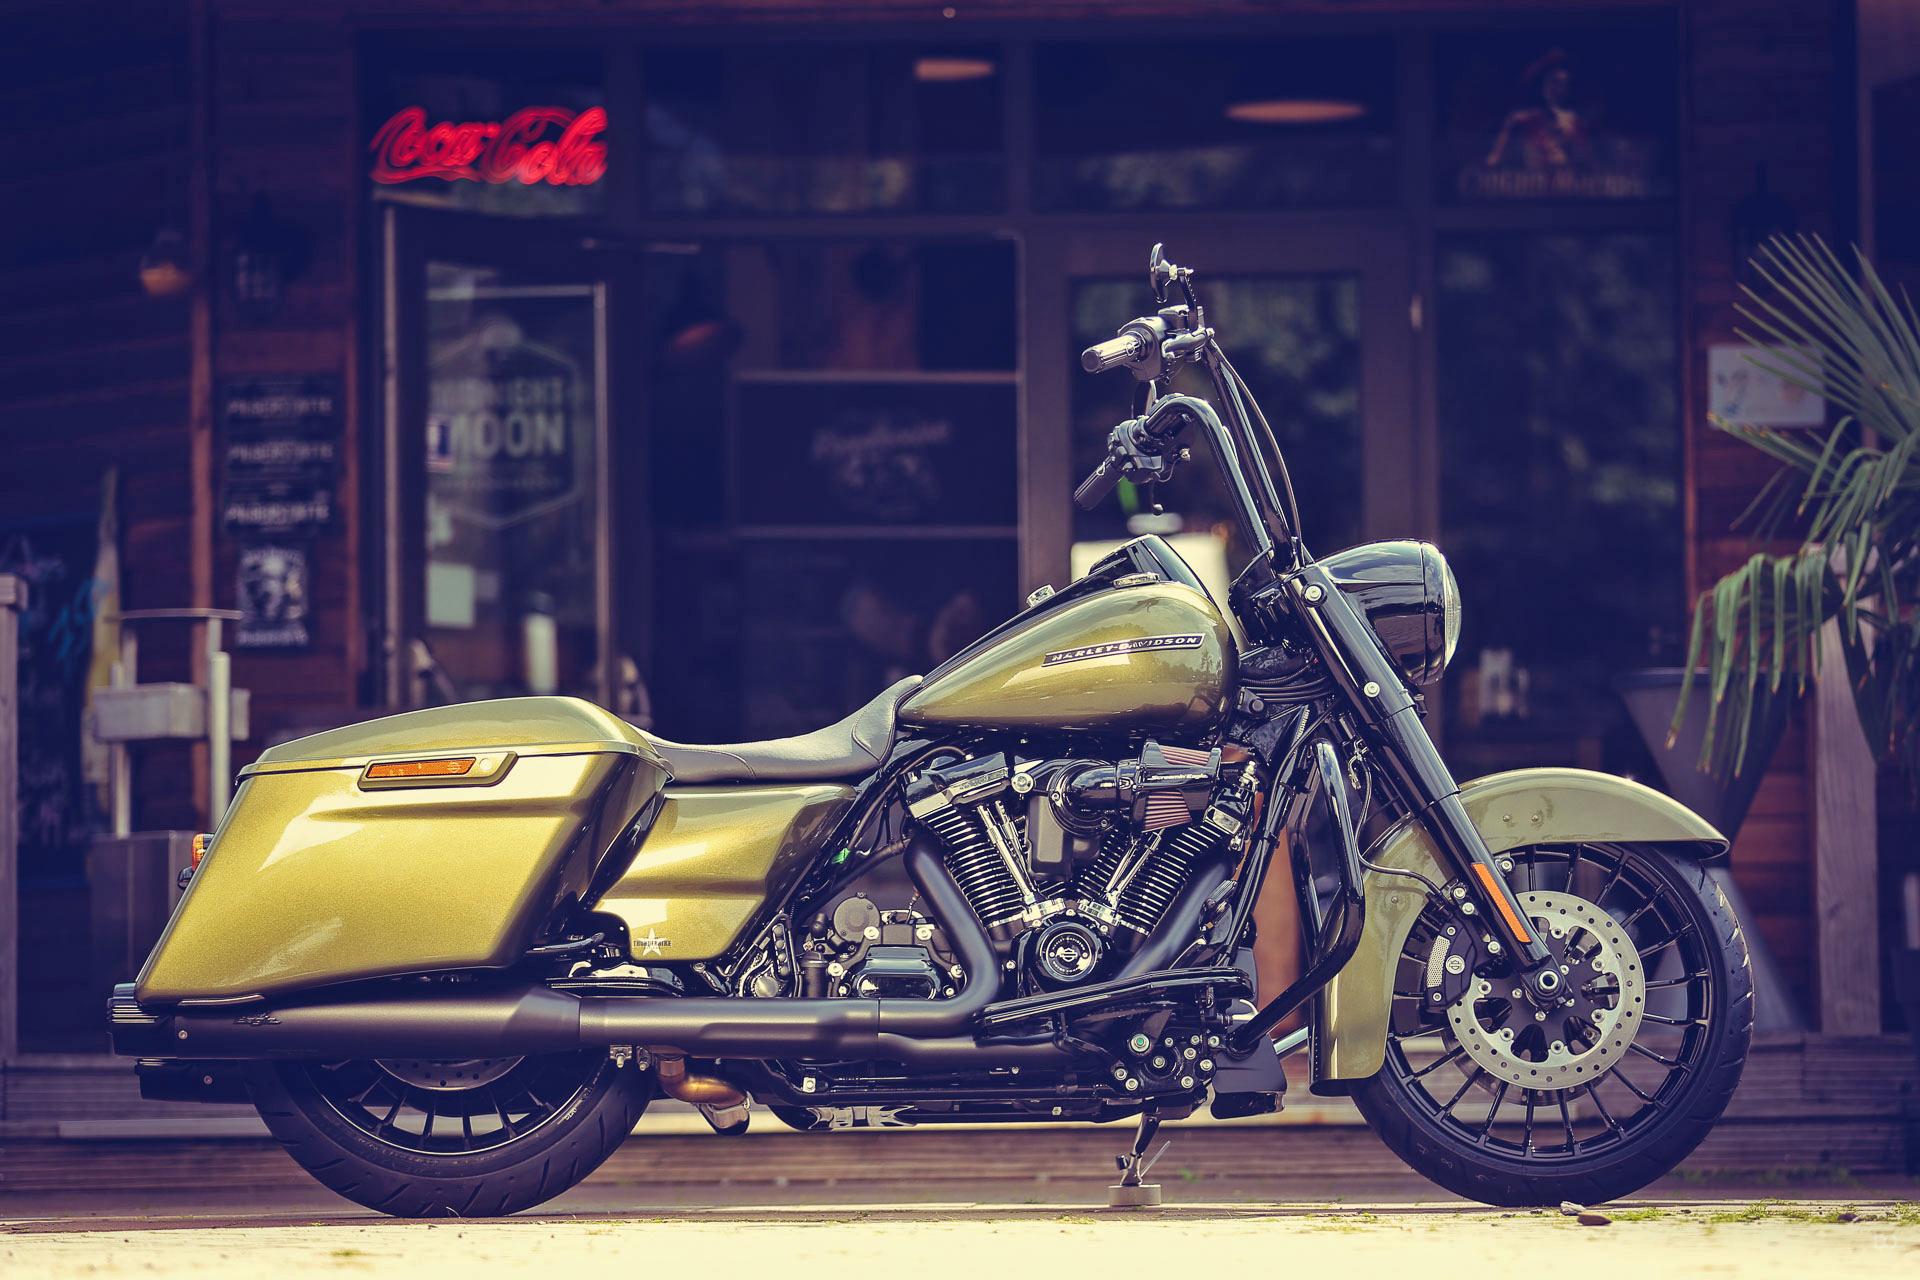 Lenker Griffe Hebel Furs Motorrad Lenker Fat Ape Hanger Classic 18 Fur Harley Road King Classic Schwarz Alquimiaong Org Br